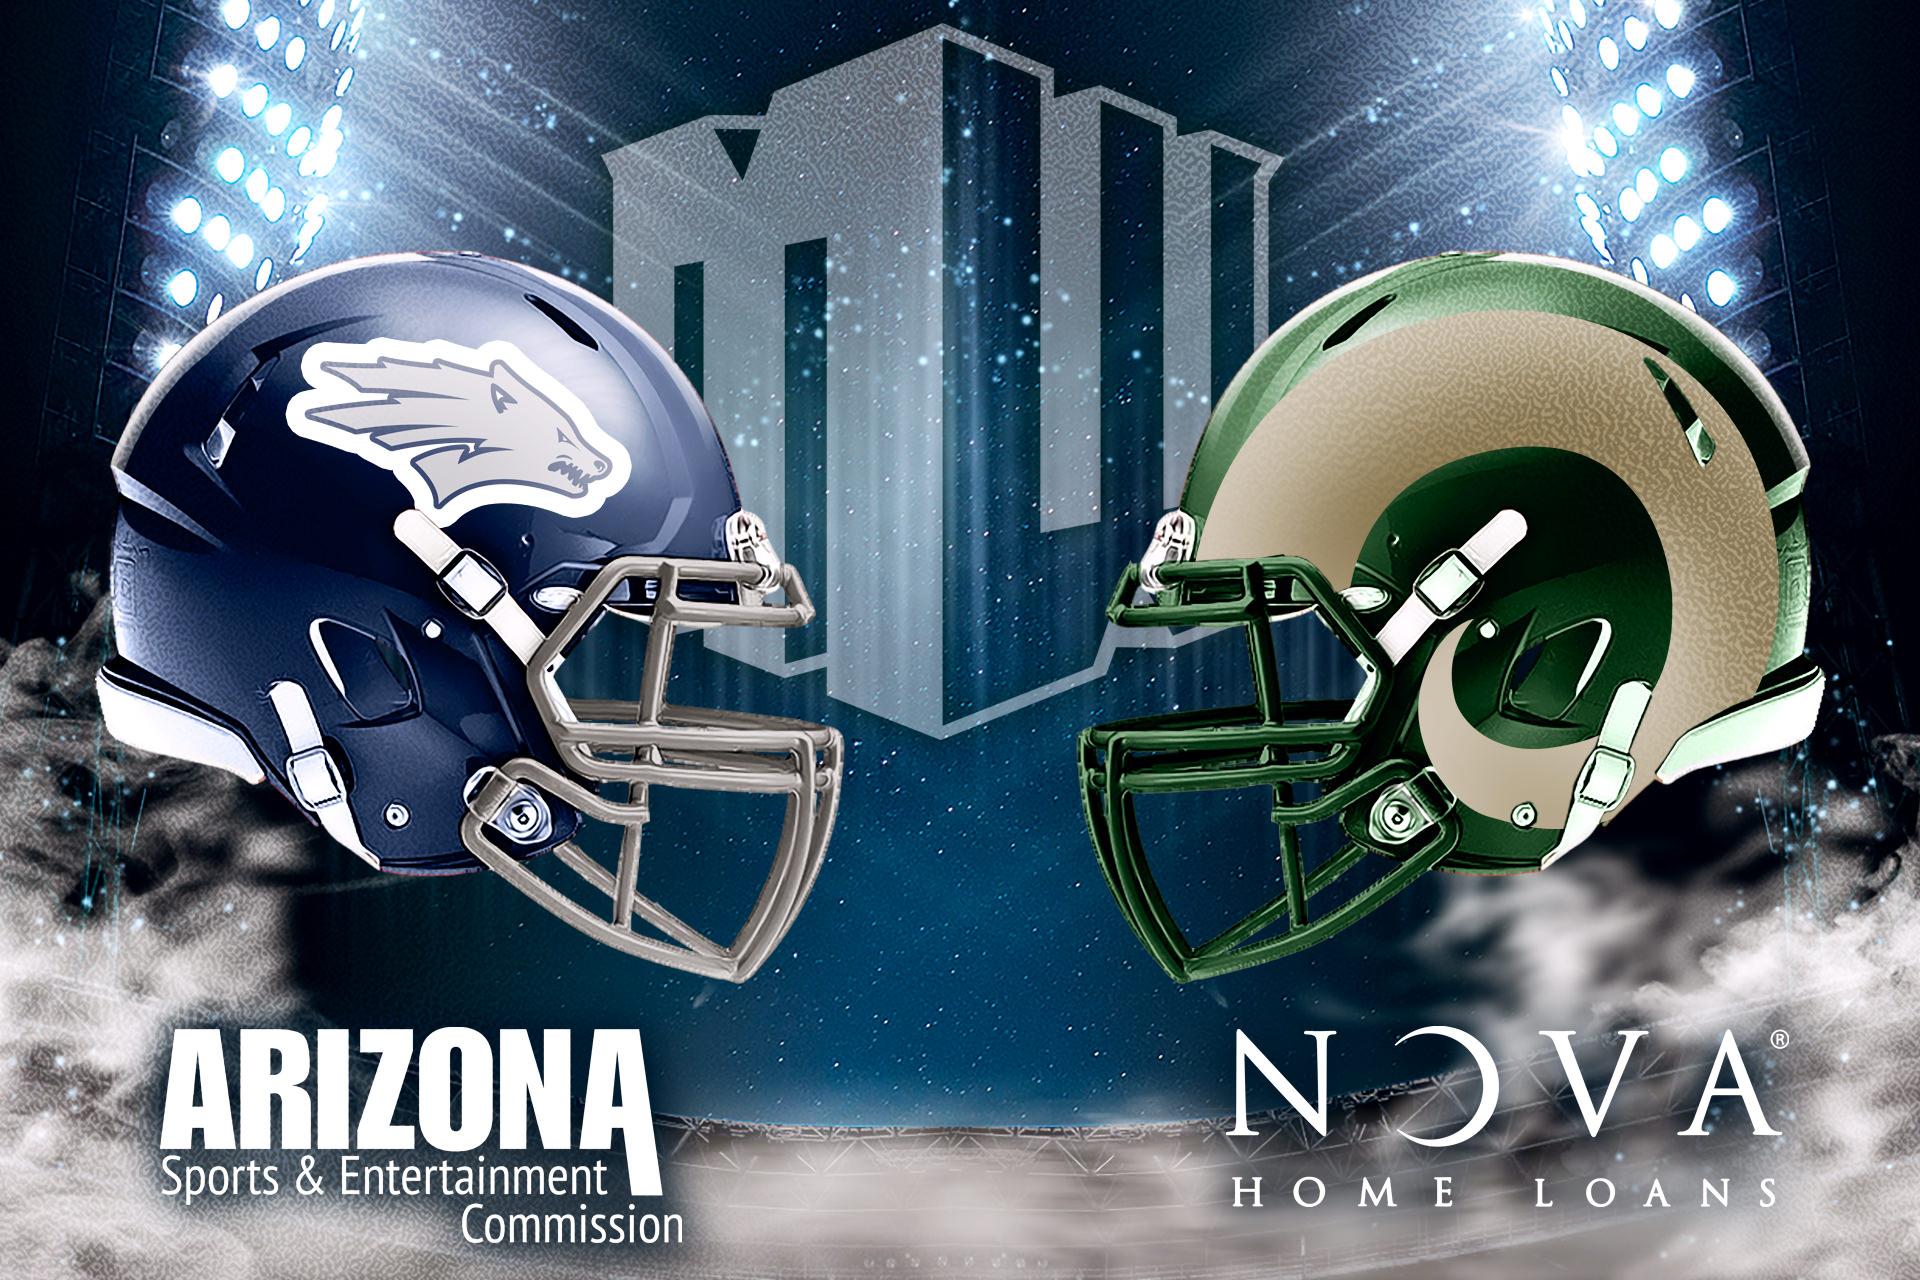 Coors Light Presents the NOVA Home Loans Arizona Bowl Downtown